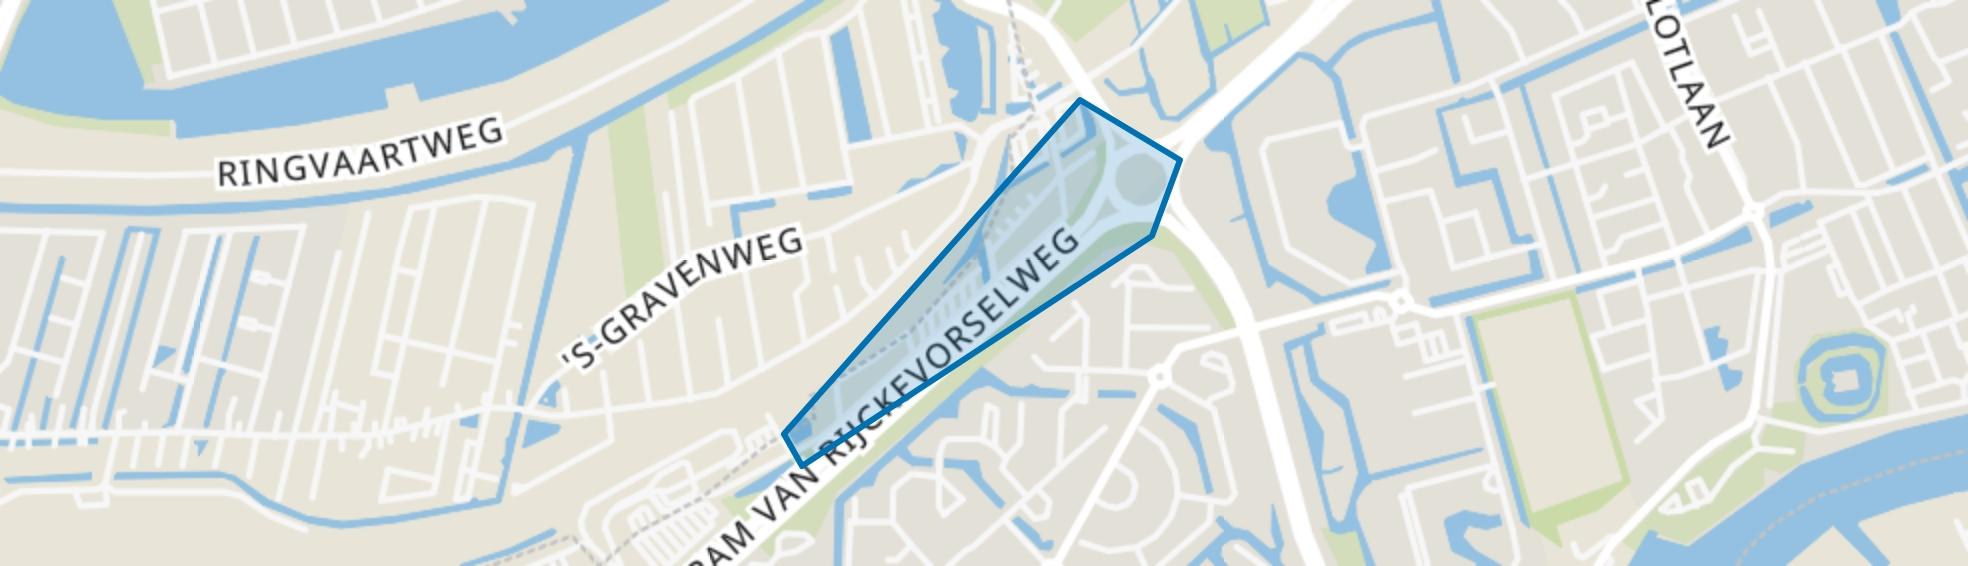 Rijckevorselpark, Capelle aan den IJssel map